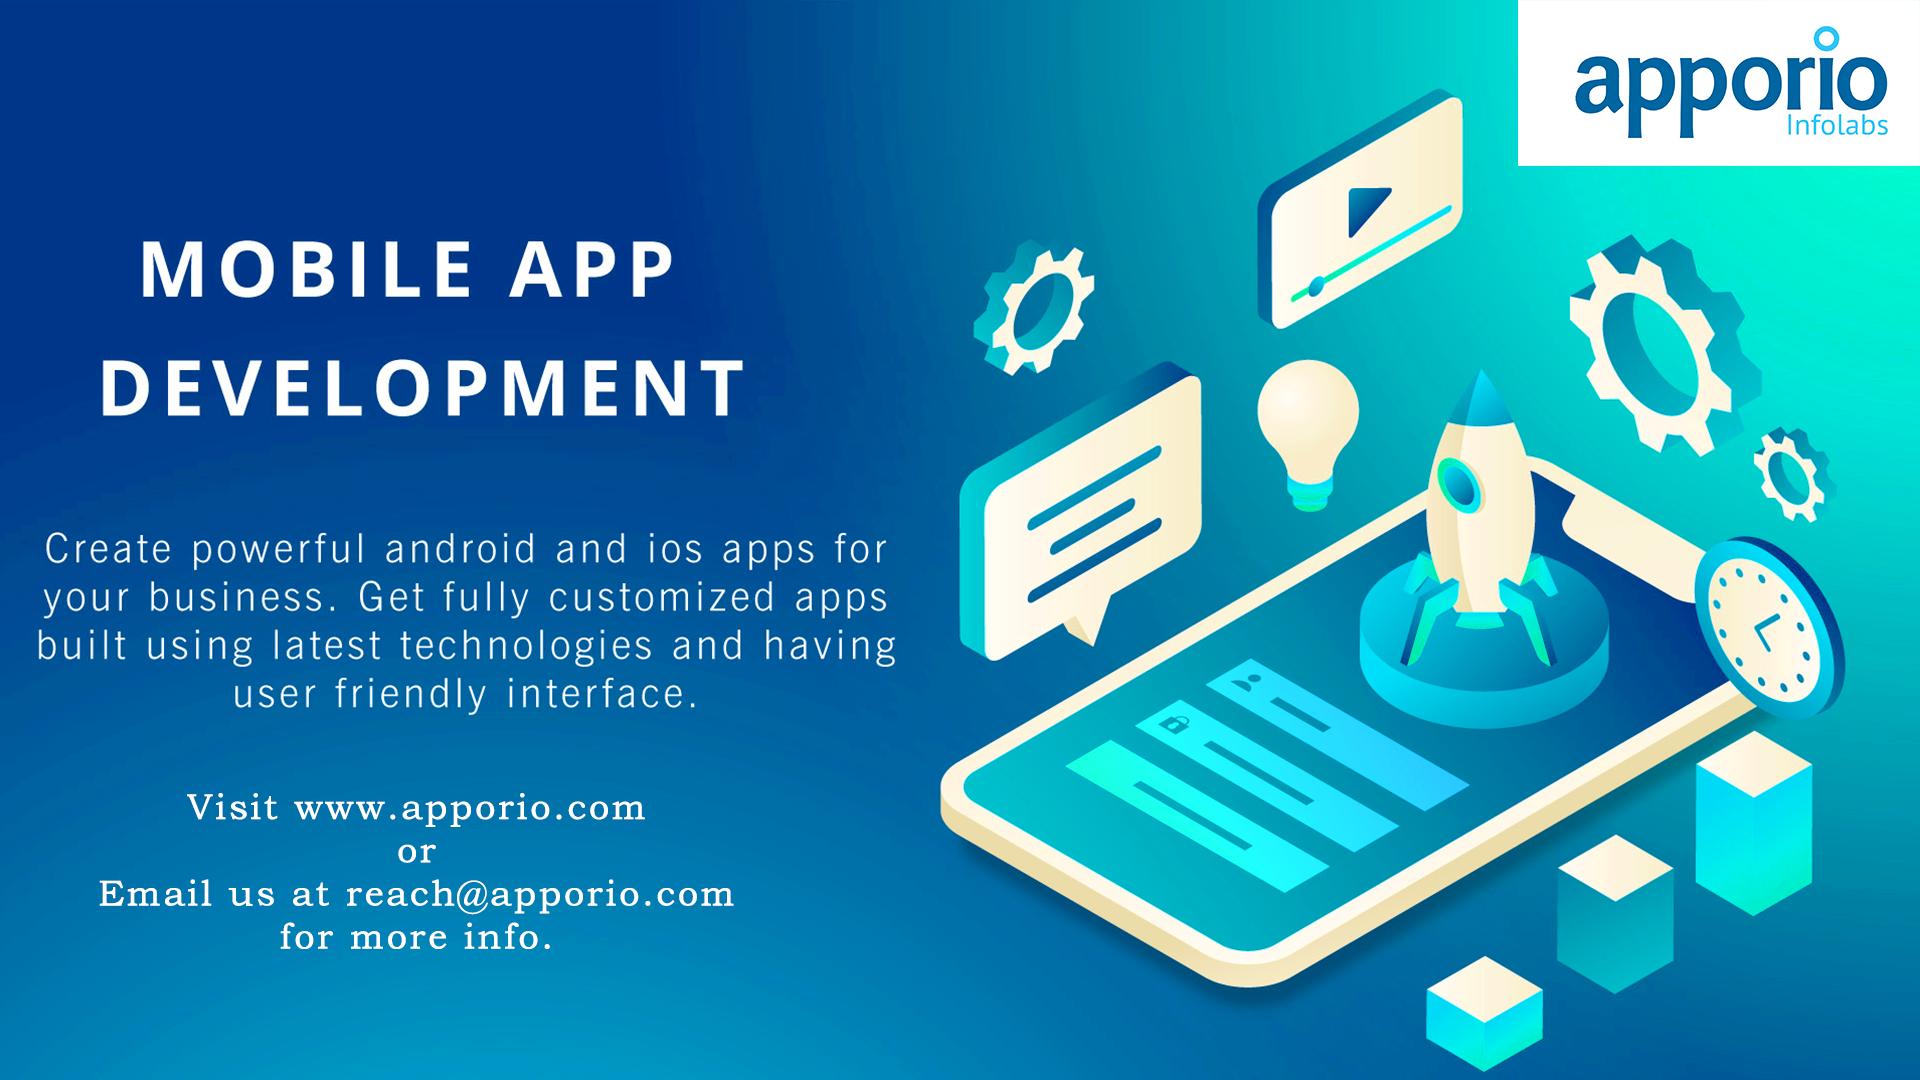 Mobile App Development App development companies, Mobile